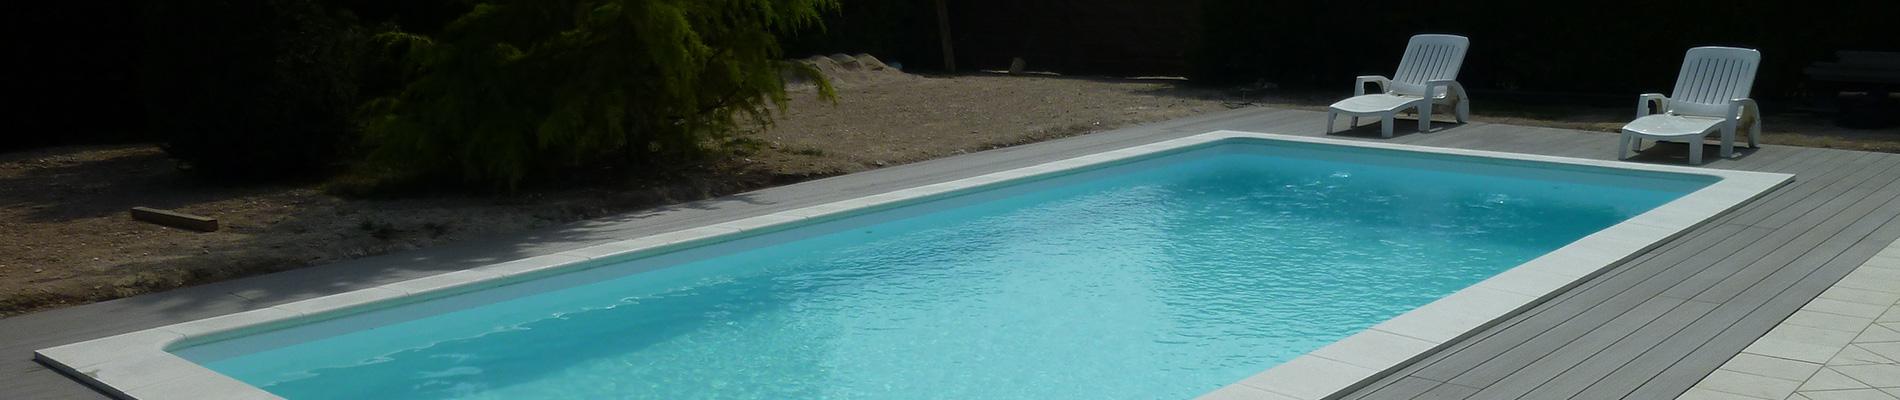 Nano la petite piscine piscines dugain troyes for Piscines dugain